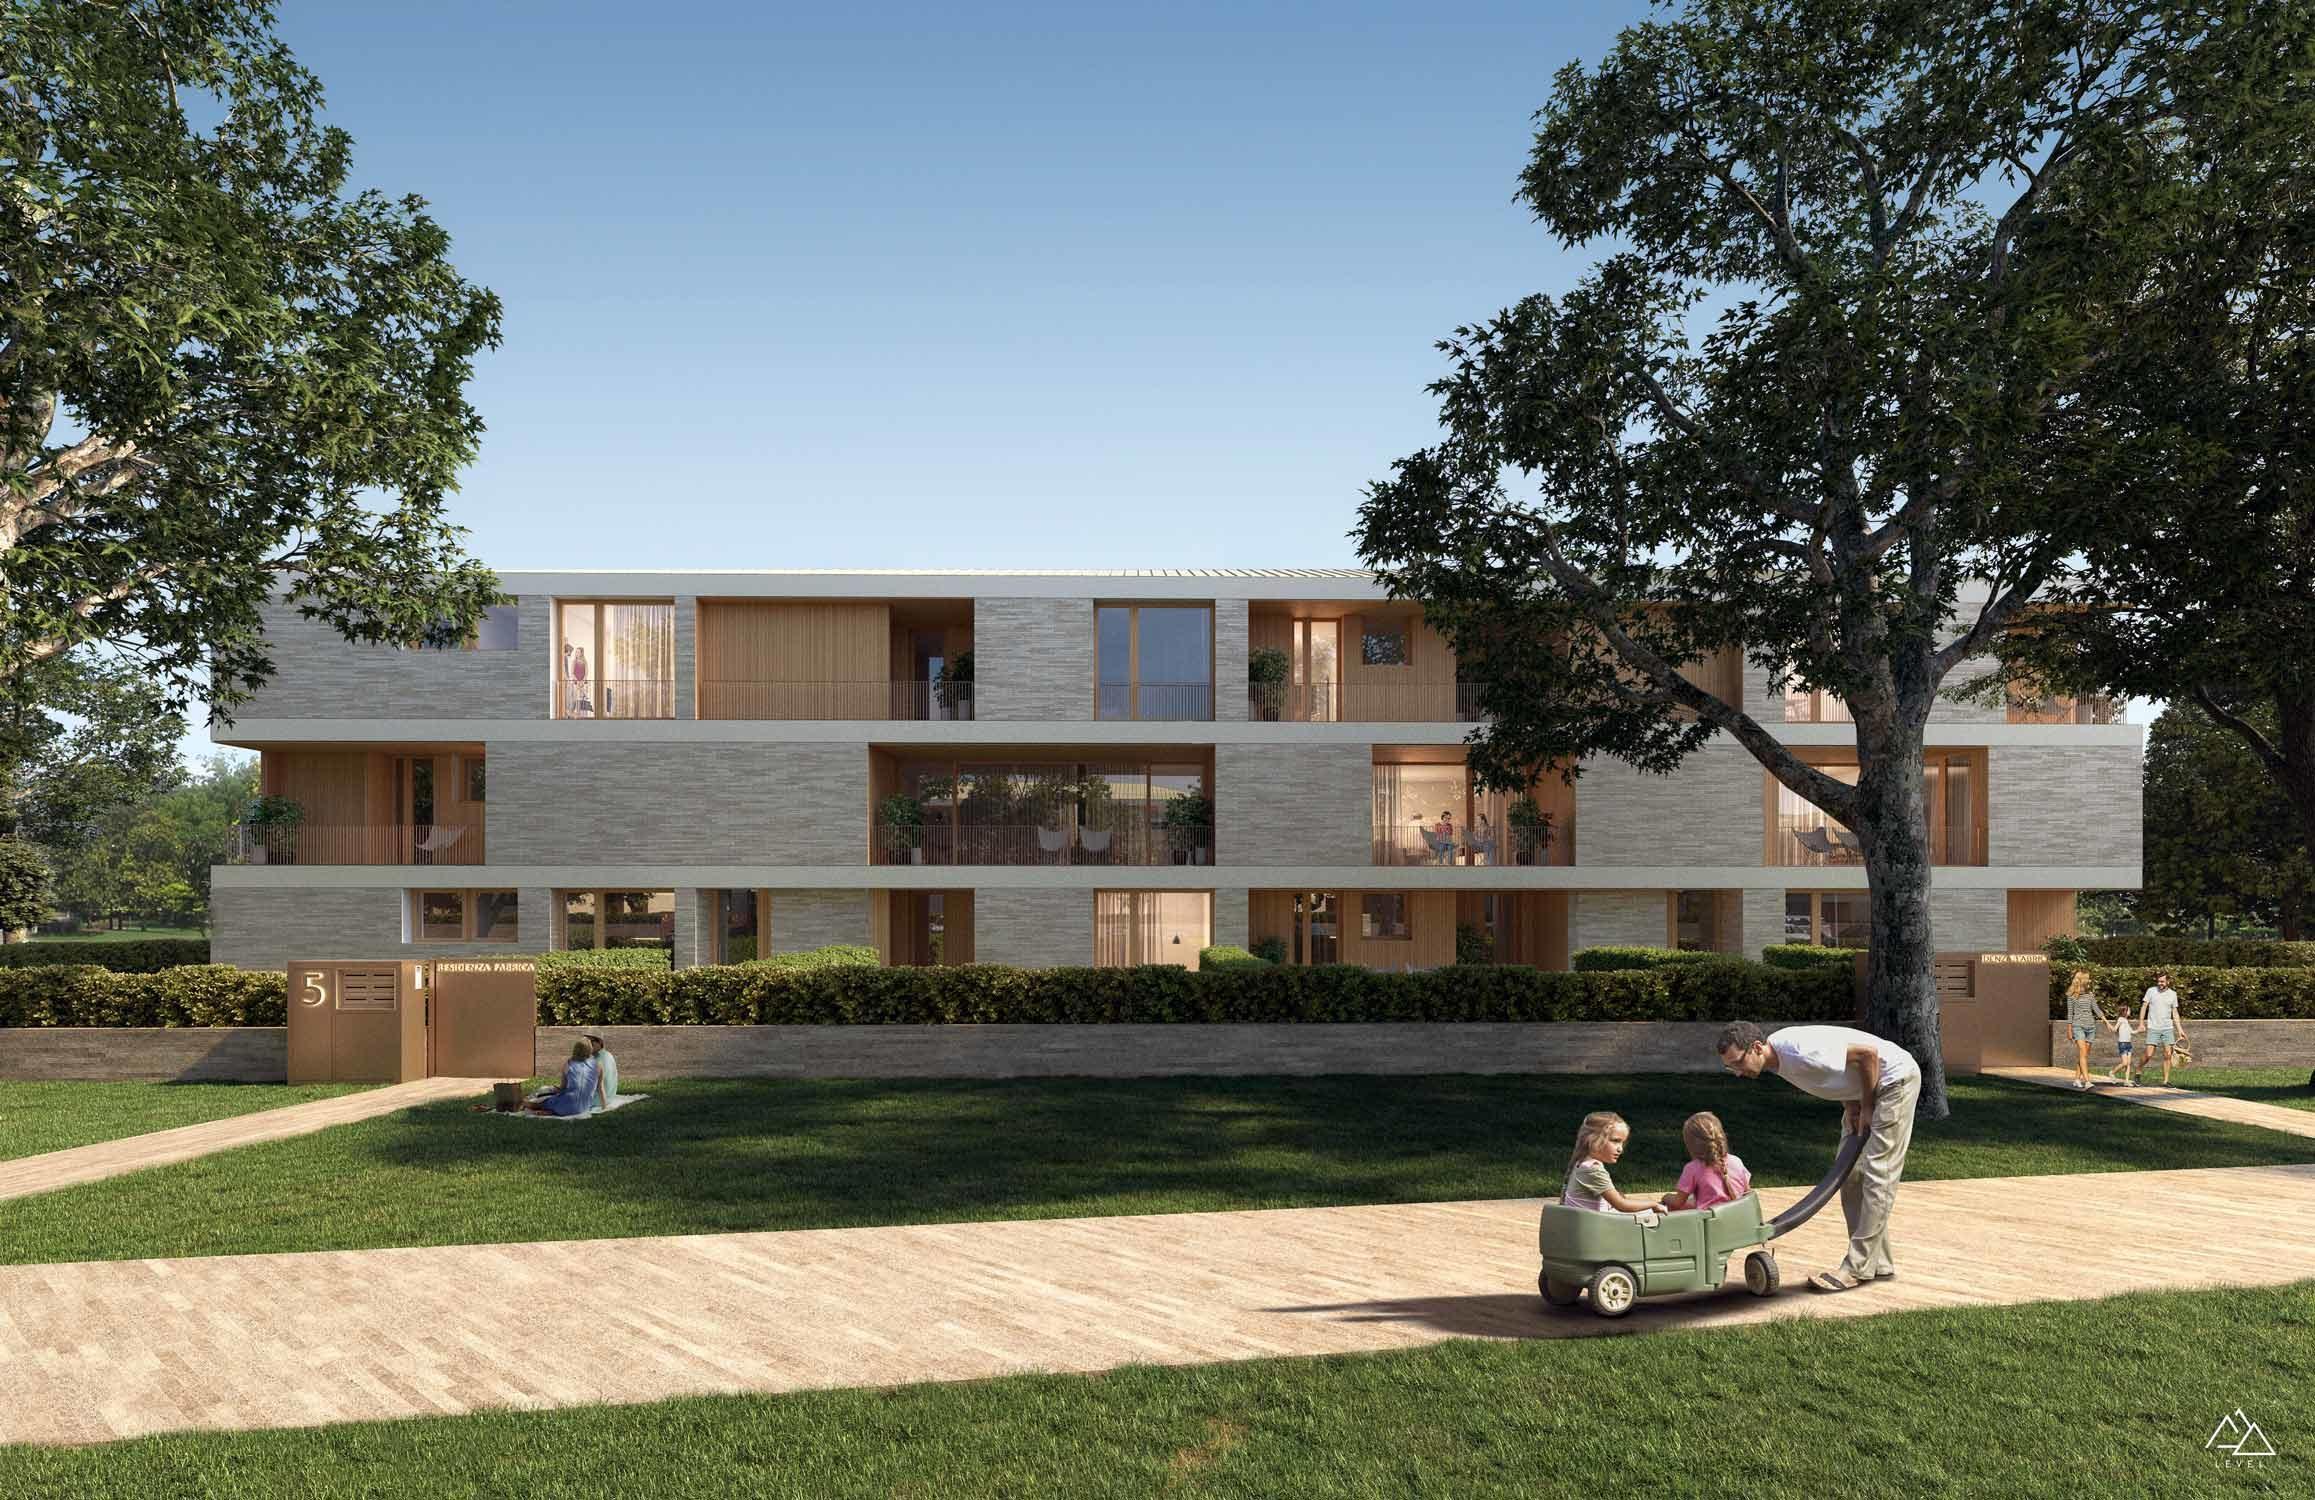 New Housing in Stezzano, Italy – Arw associates, 2020